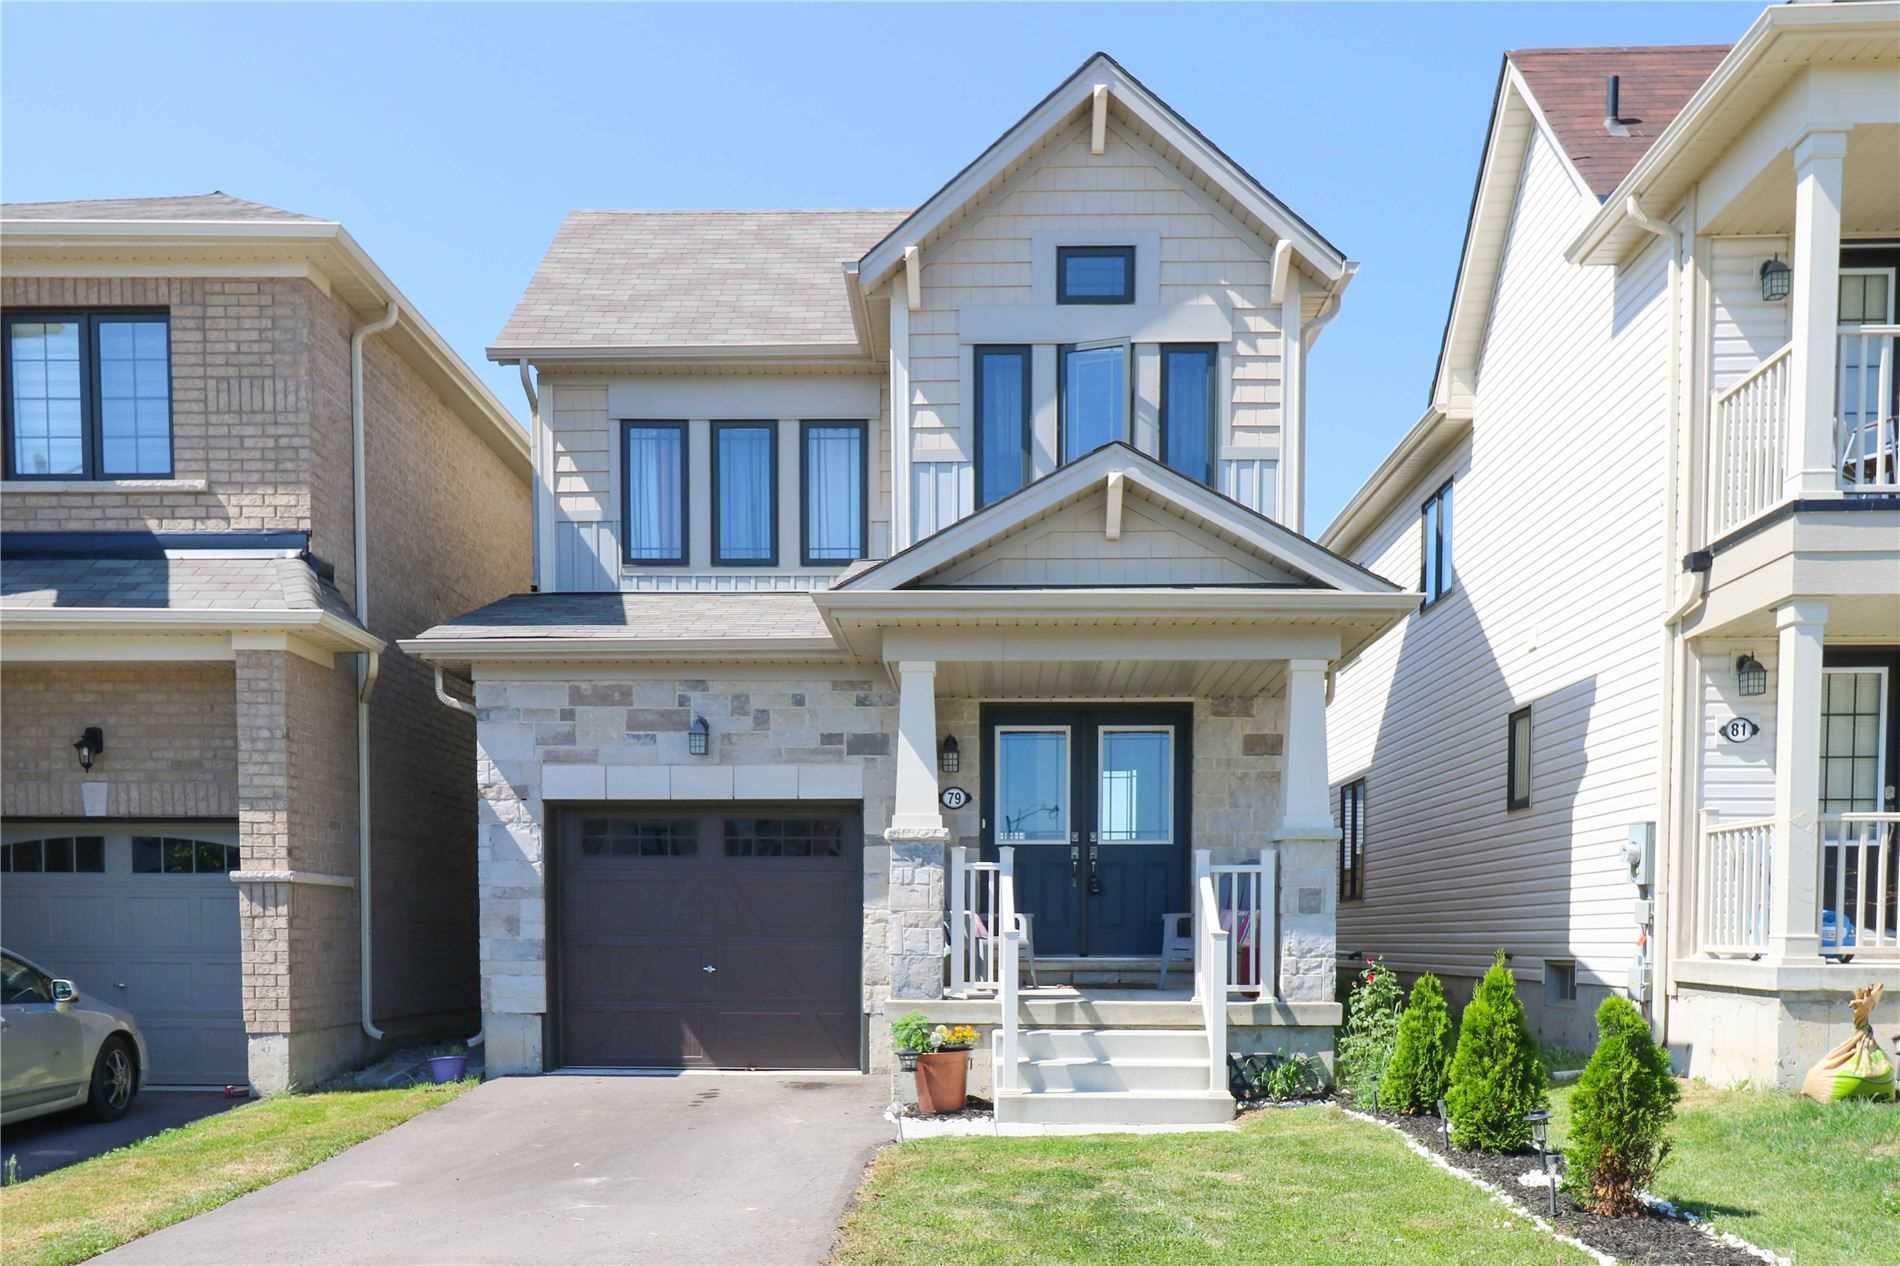 79 Arnold Marshall Blvd, Haldimand, Ontario N3W 0B4, 3 Bedrooms Bedrooms, ,3 BathroomsBathrooms,Detached,For Sale,Arnold Marshall,X5273184